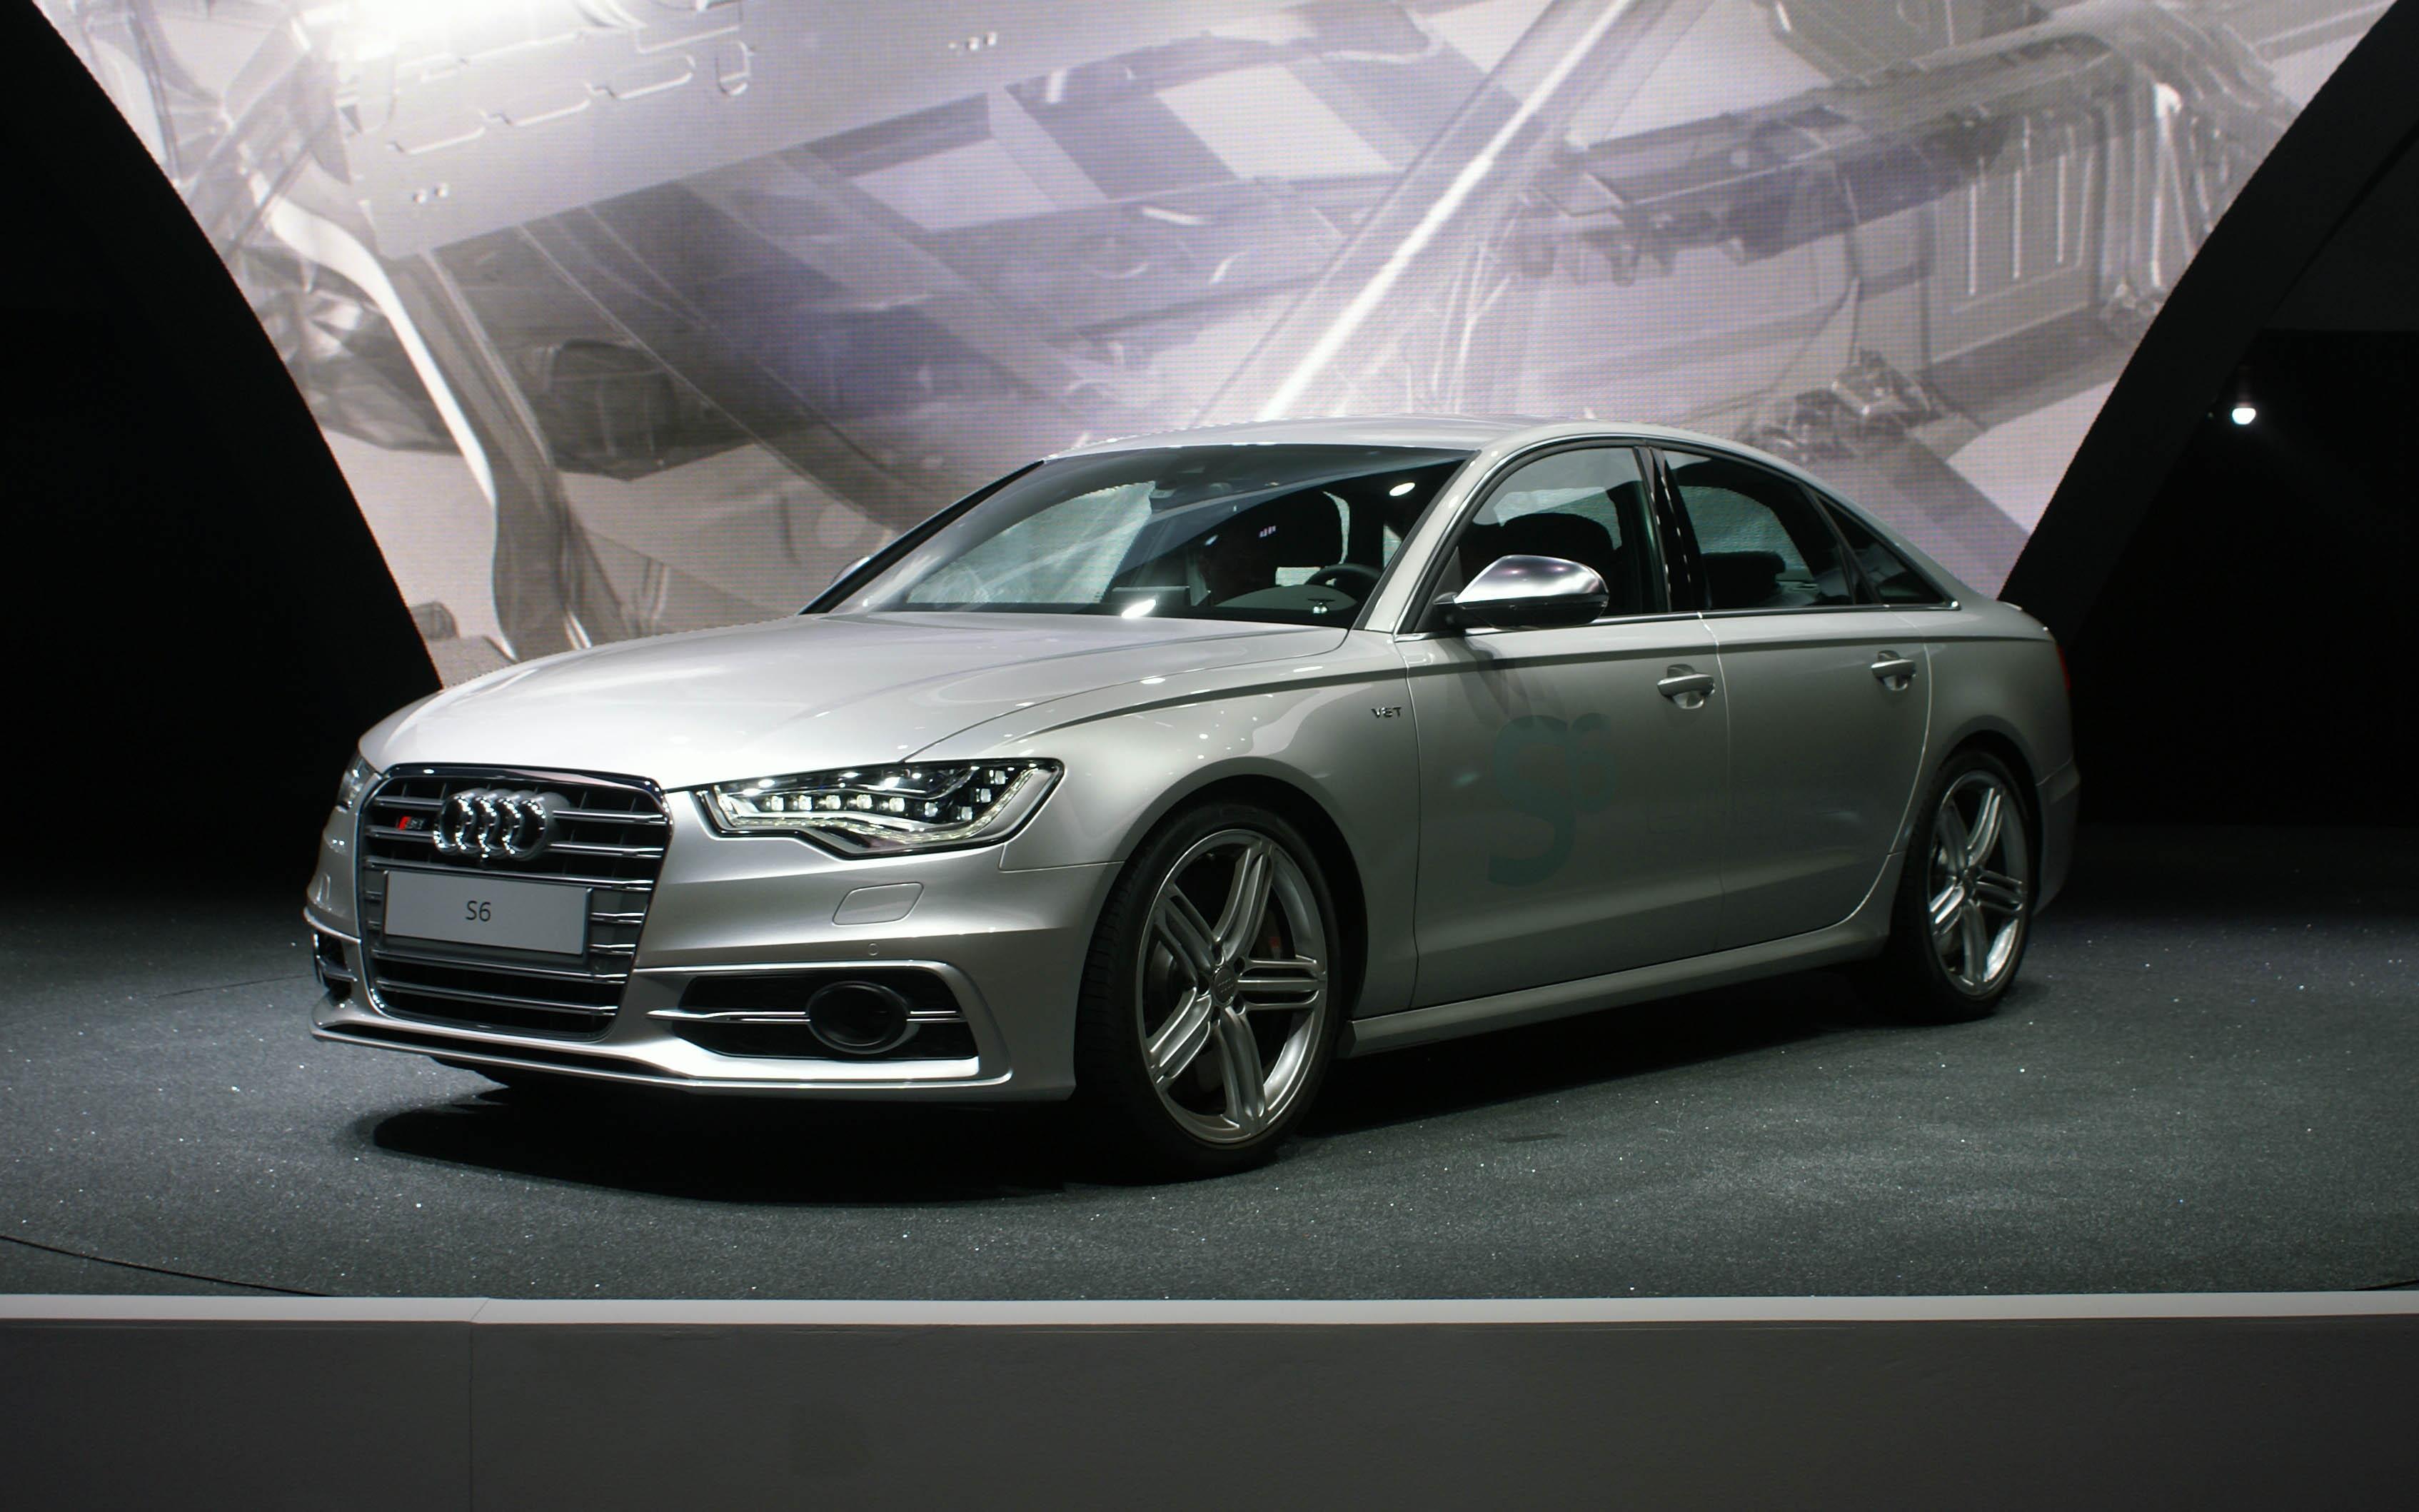 Audi S6 Wikipedia